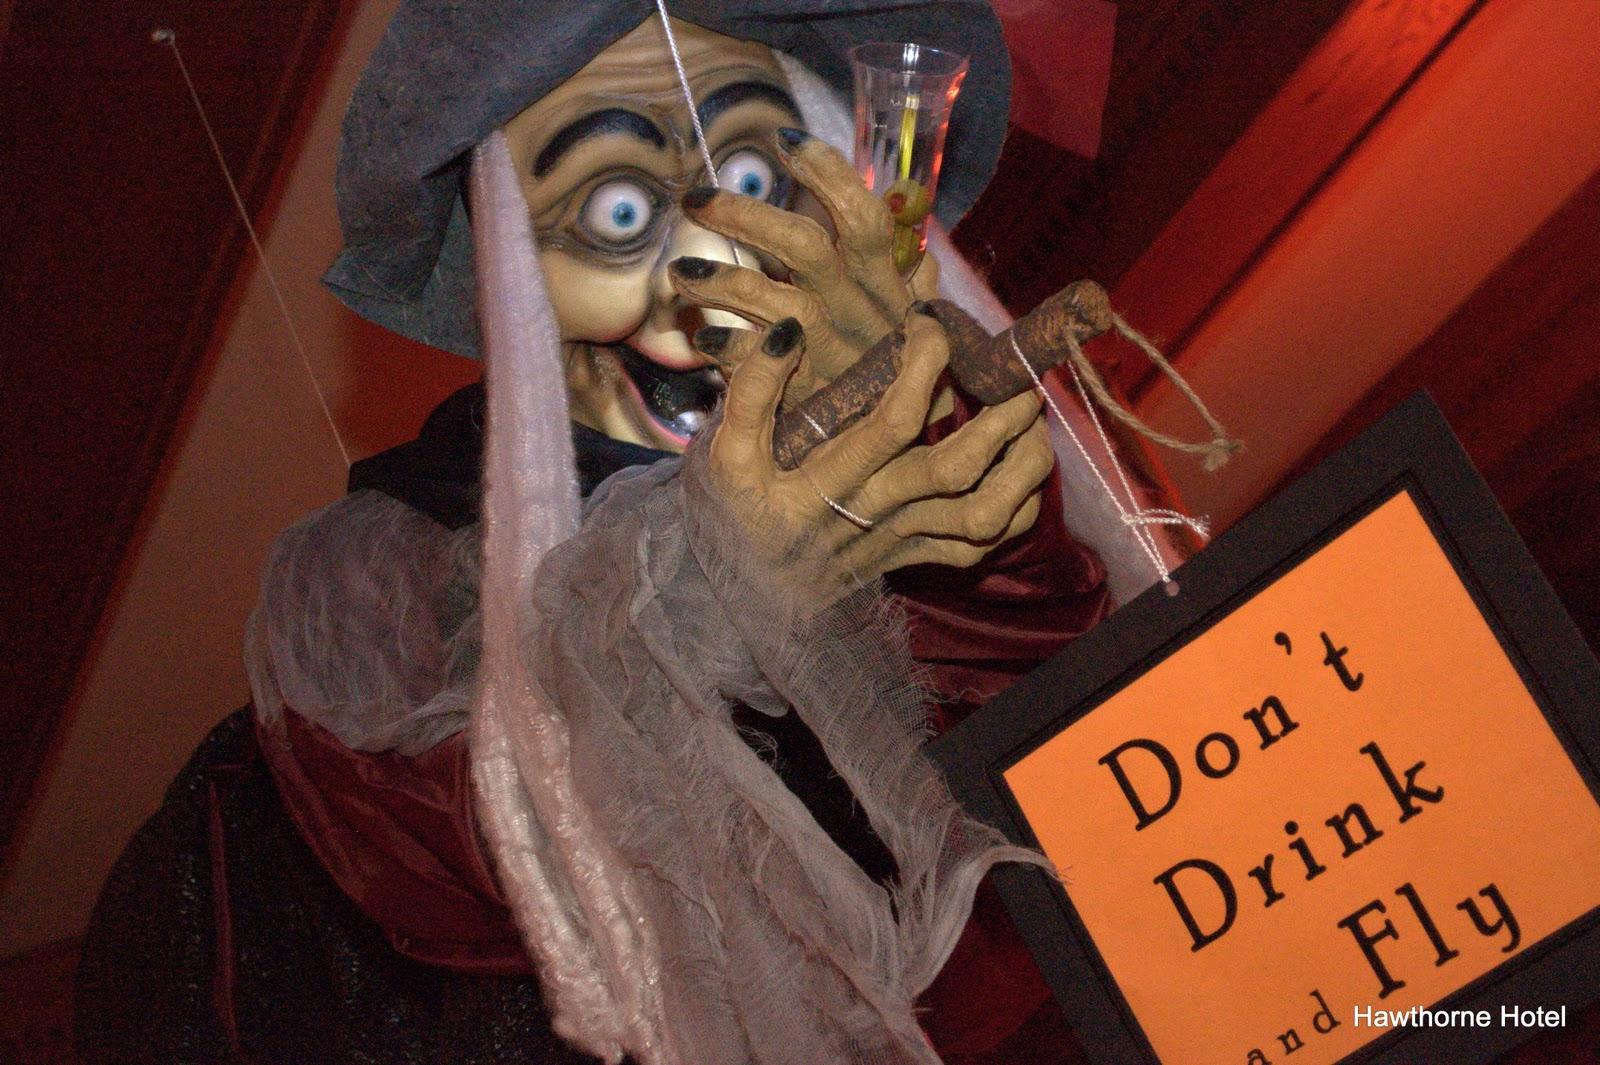 Hawthorne Hotel: More Halloween Ball Photos